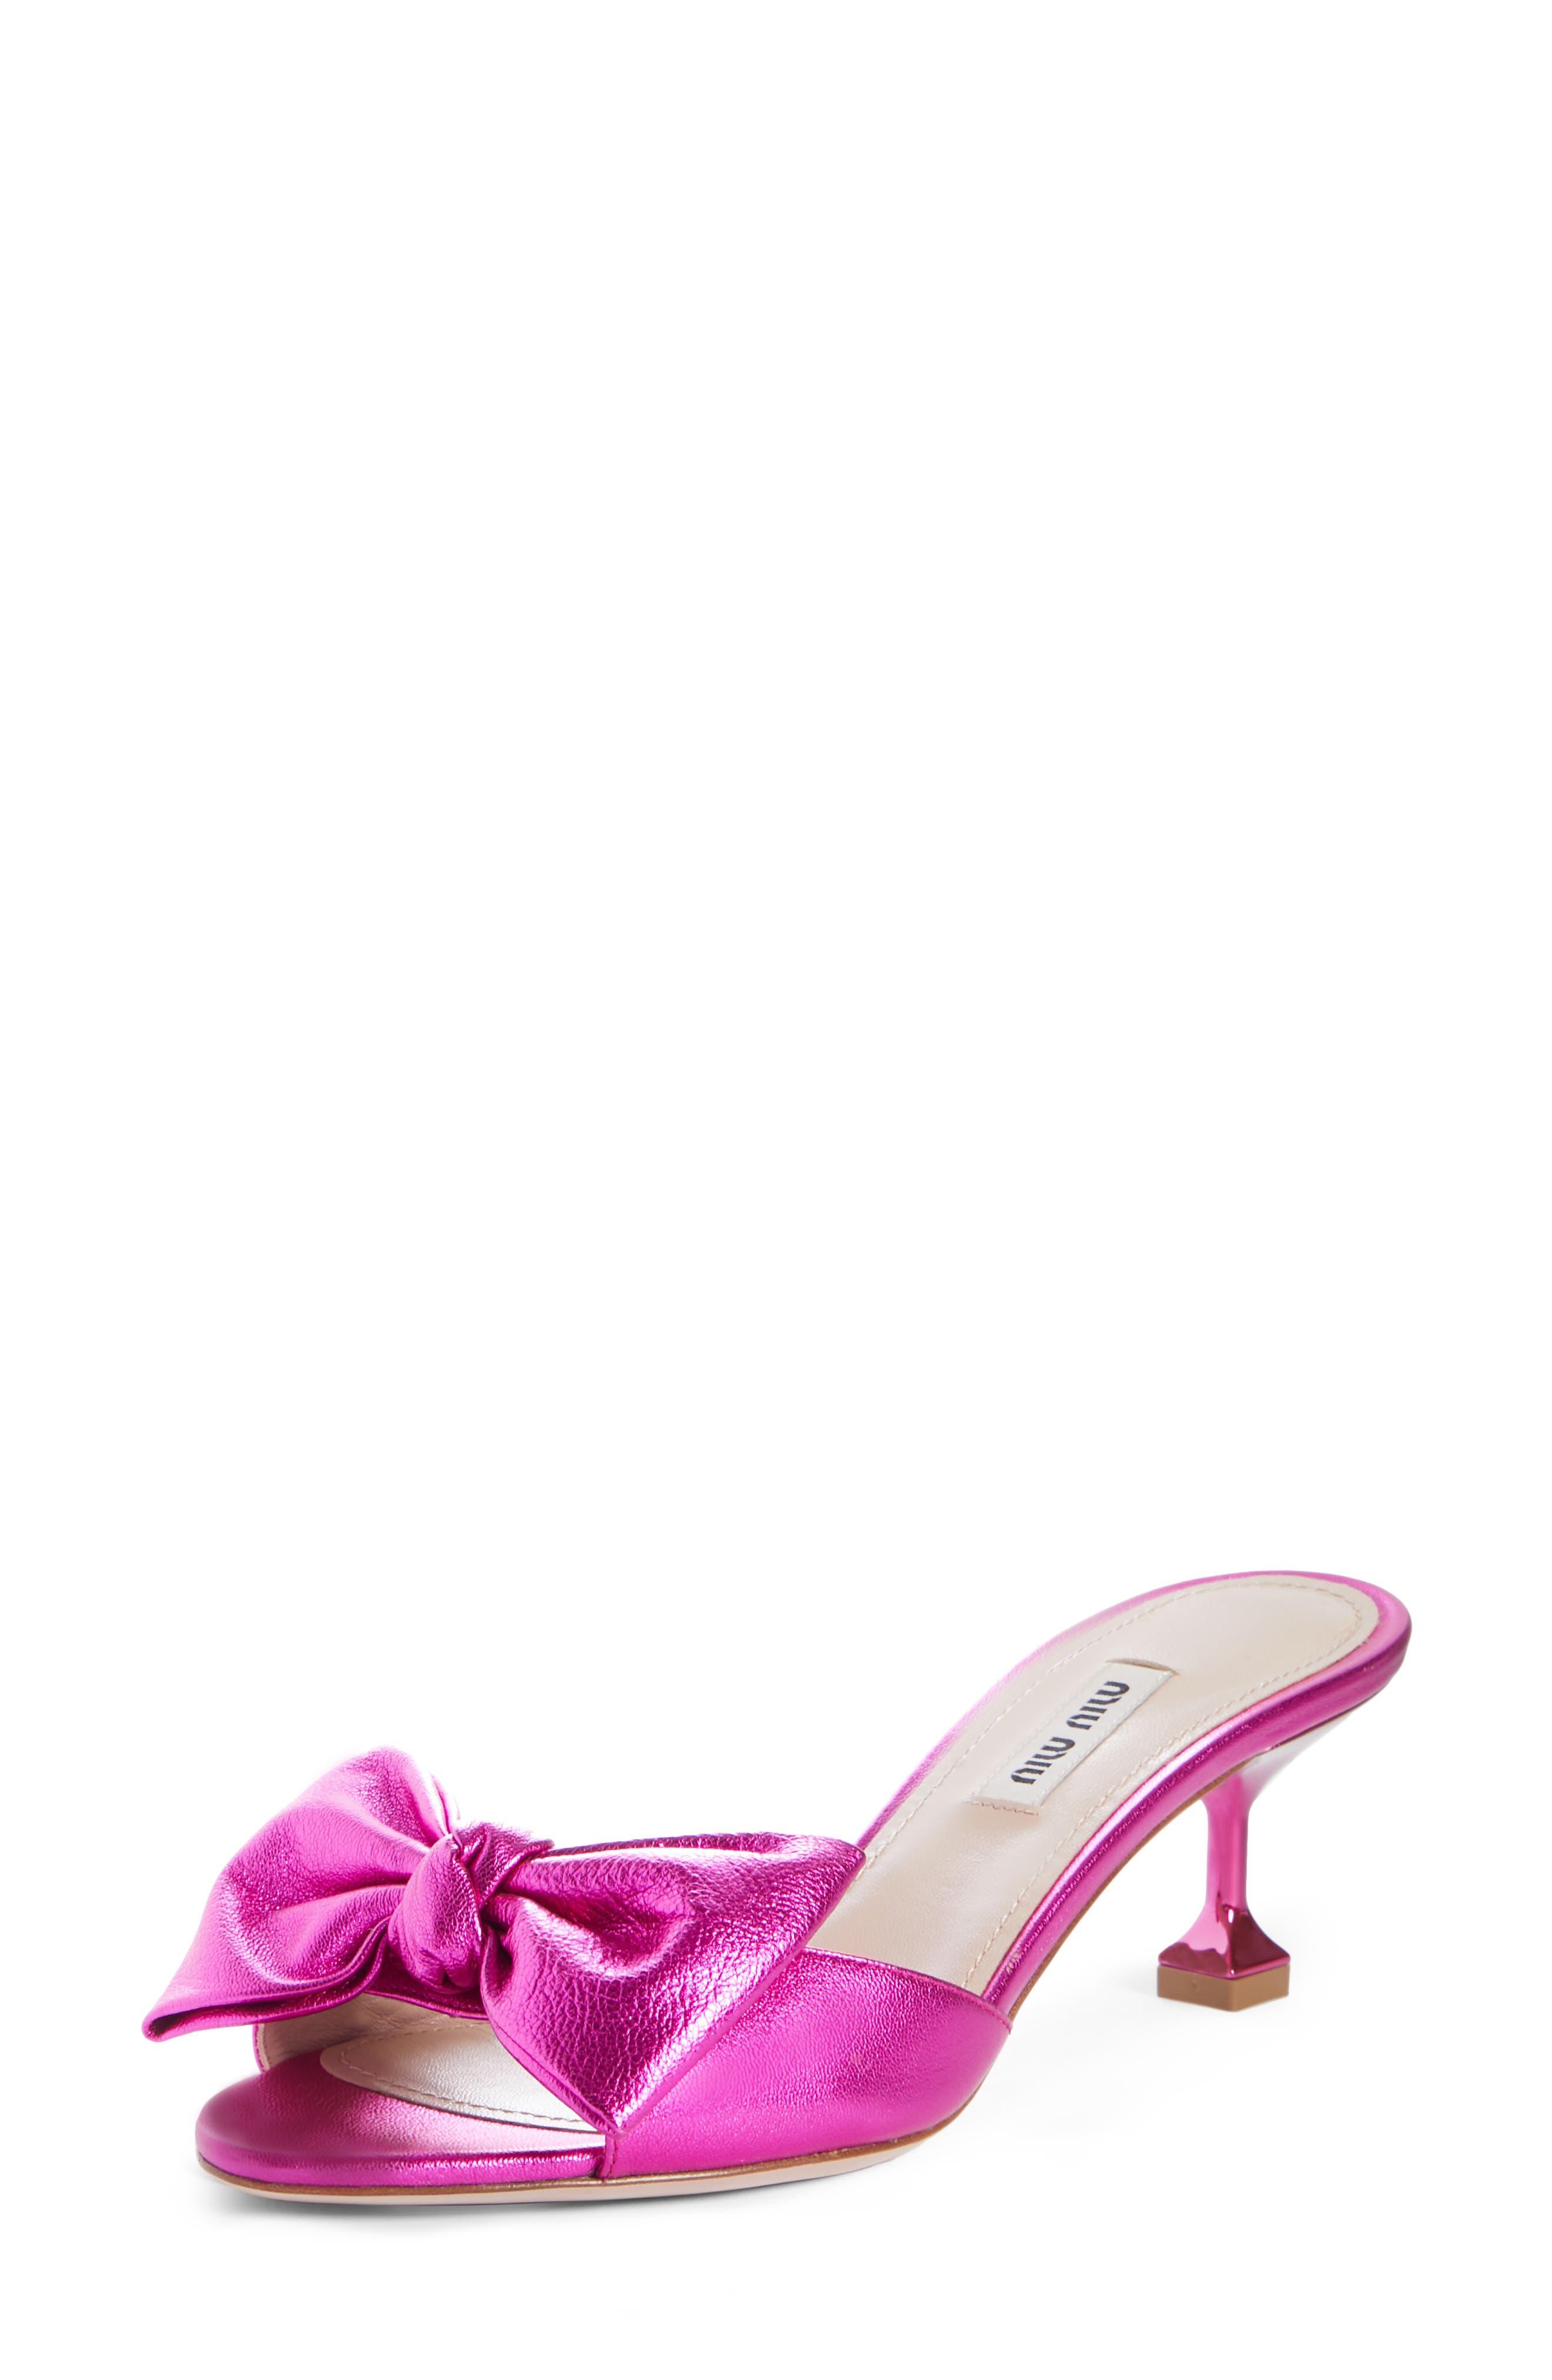 Bow Slide Sandal, Main, color, FUCHSIA